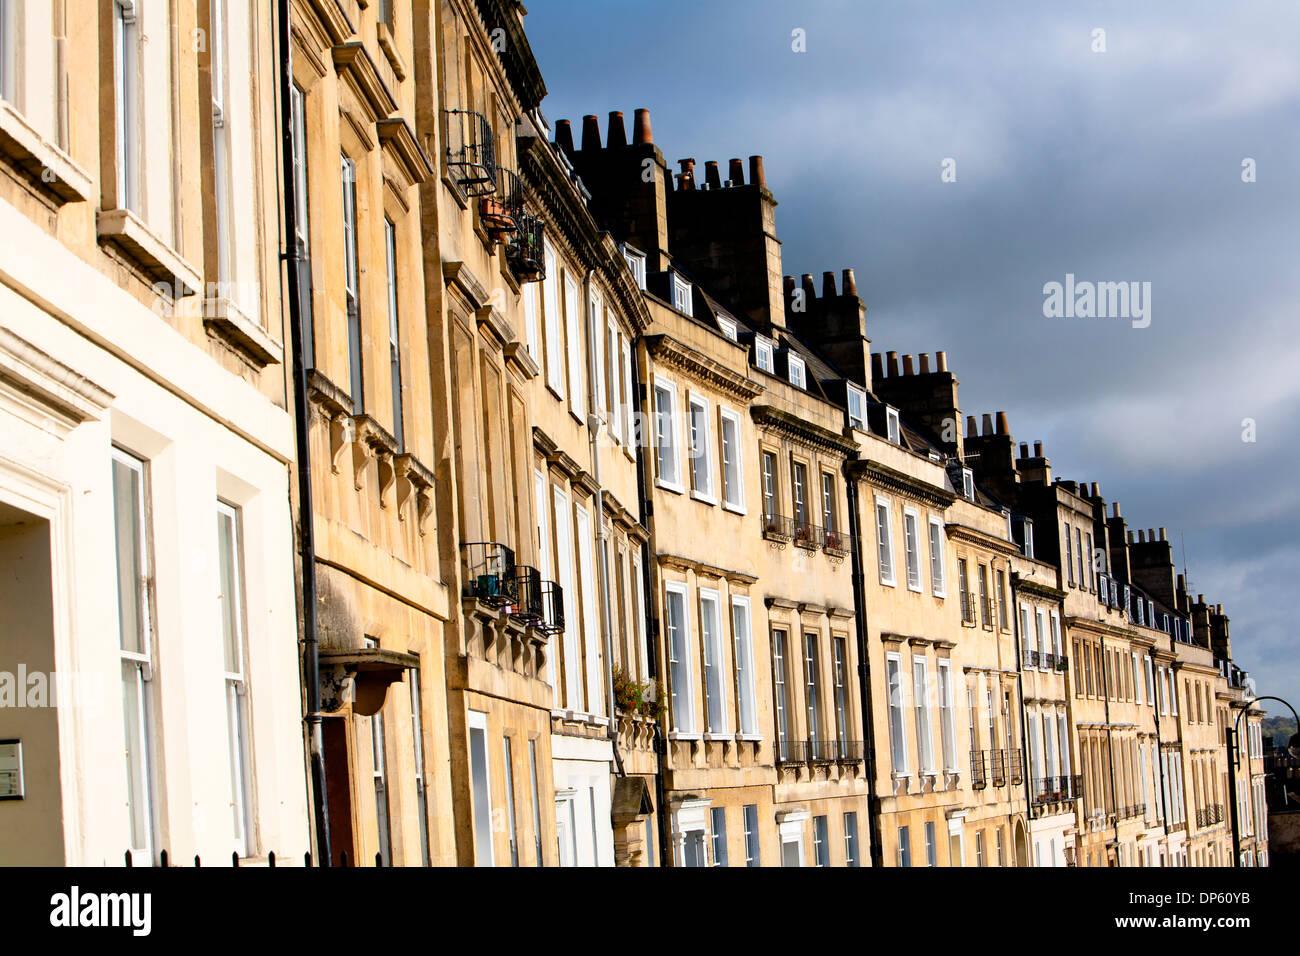 Row of Georgian Townhouses in Bath, England, UK - Stock Image